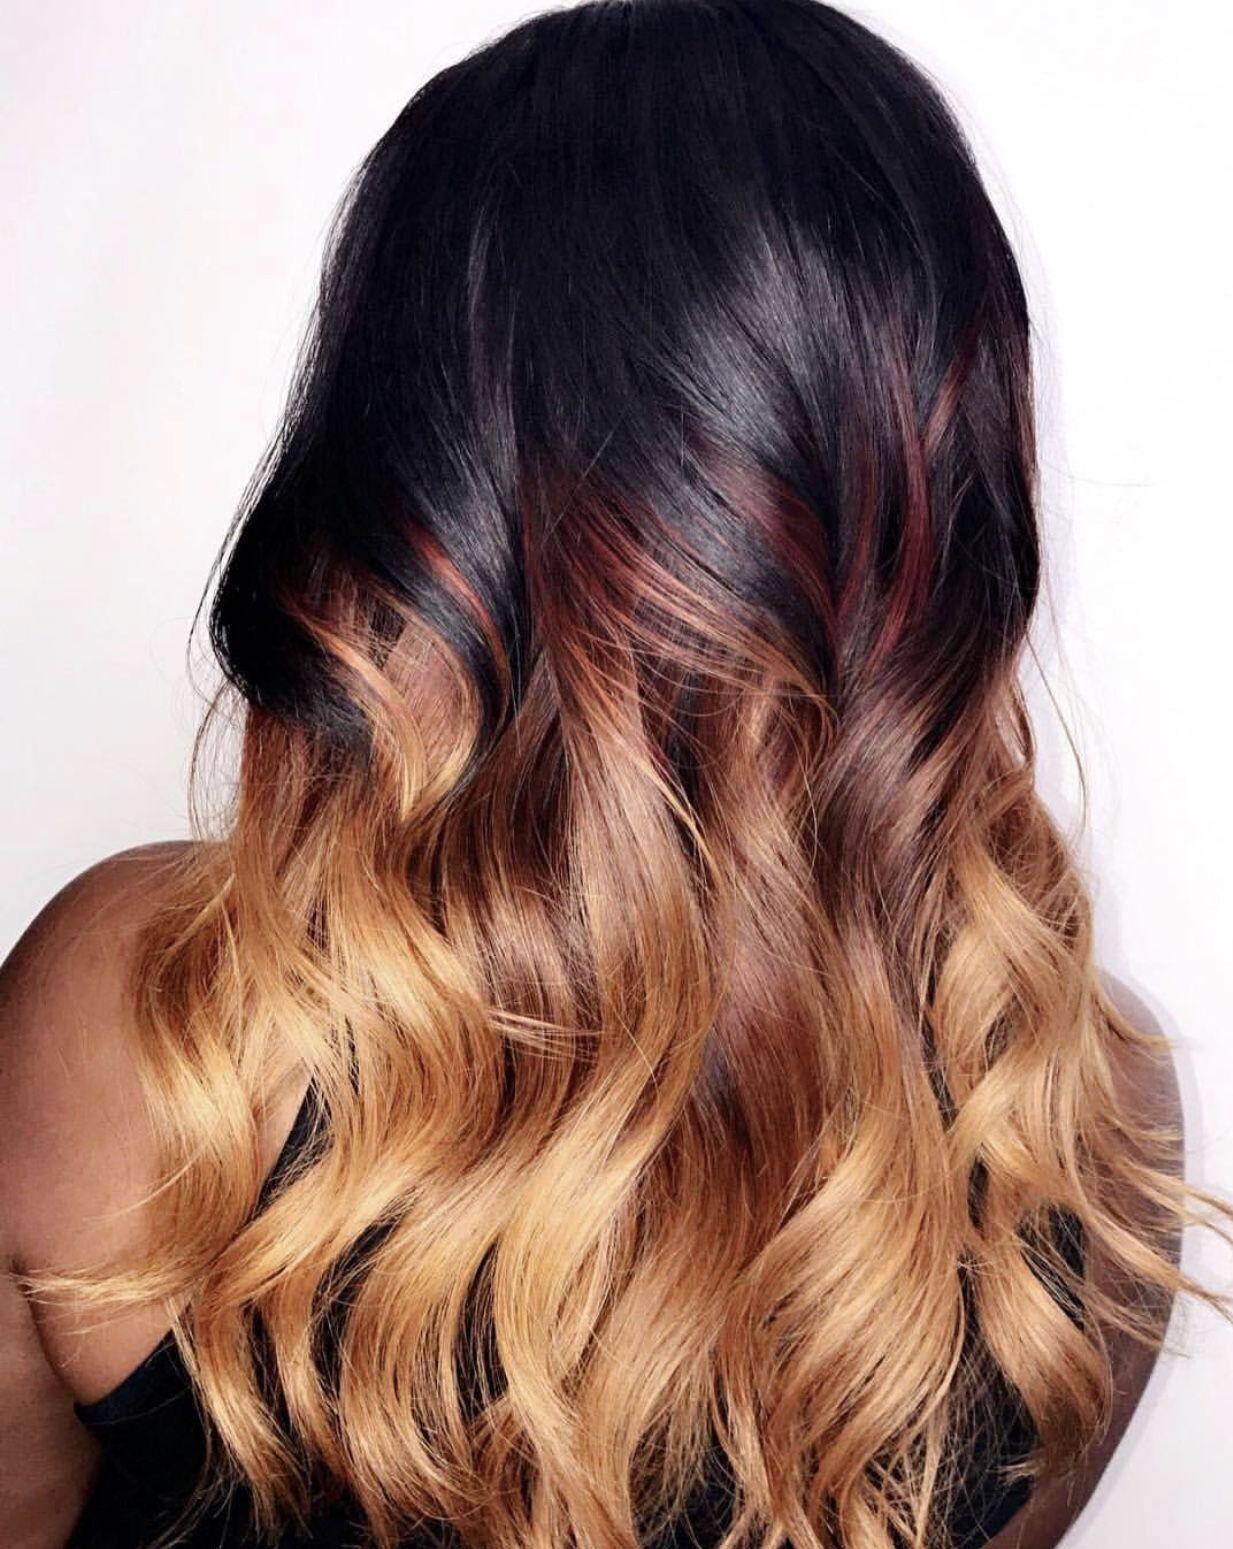 Pin By Makaela Swinney On Hair Brunette Hair Color Hair Styles Fall Hair